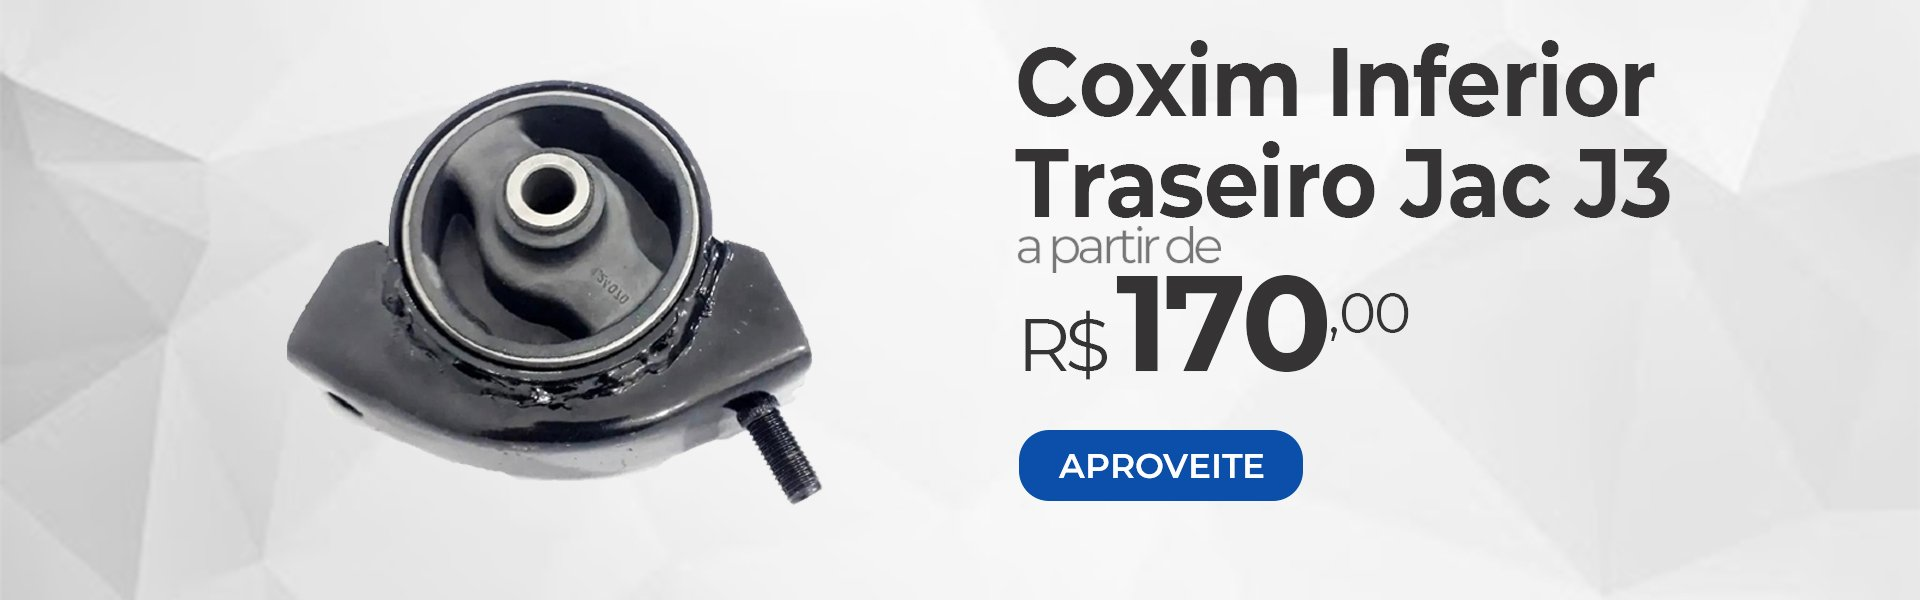 BANNER COXIM J3 INF TRAS